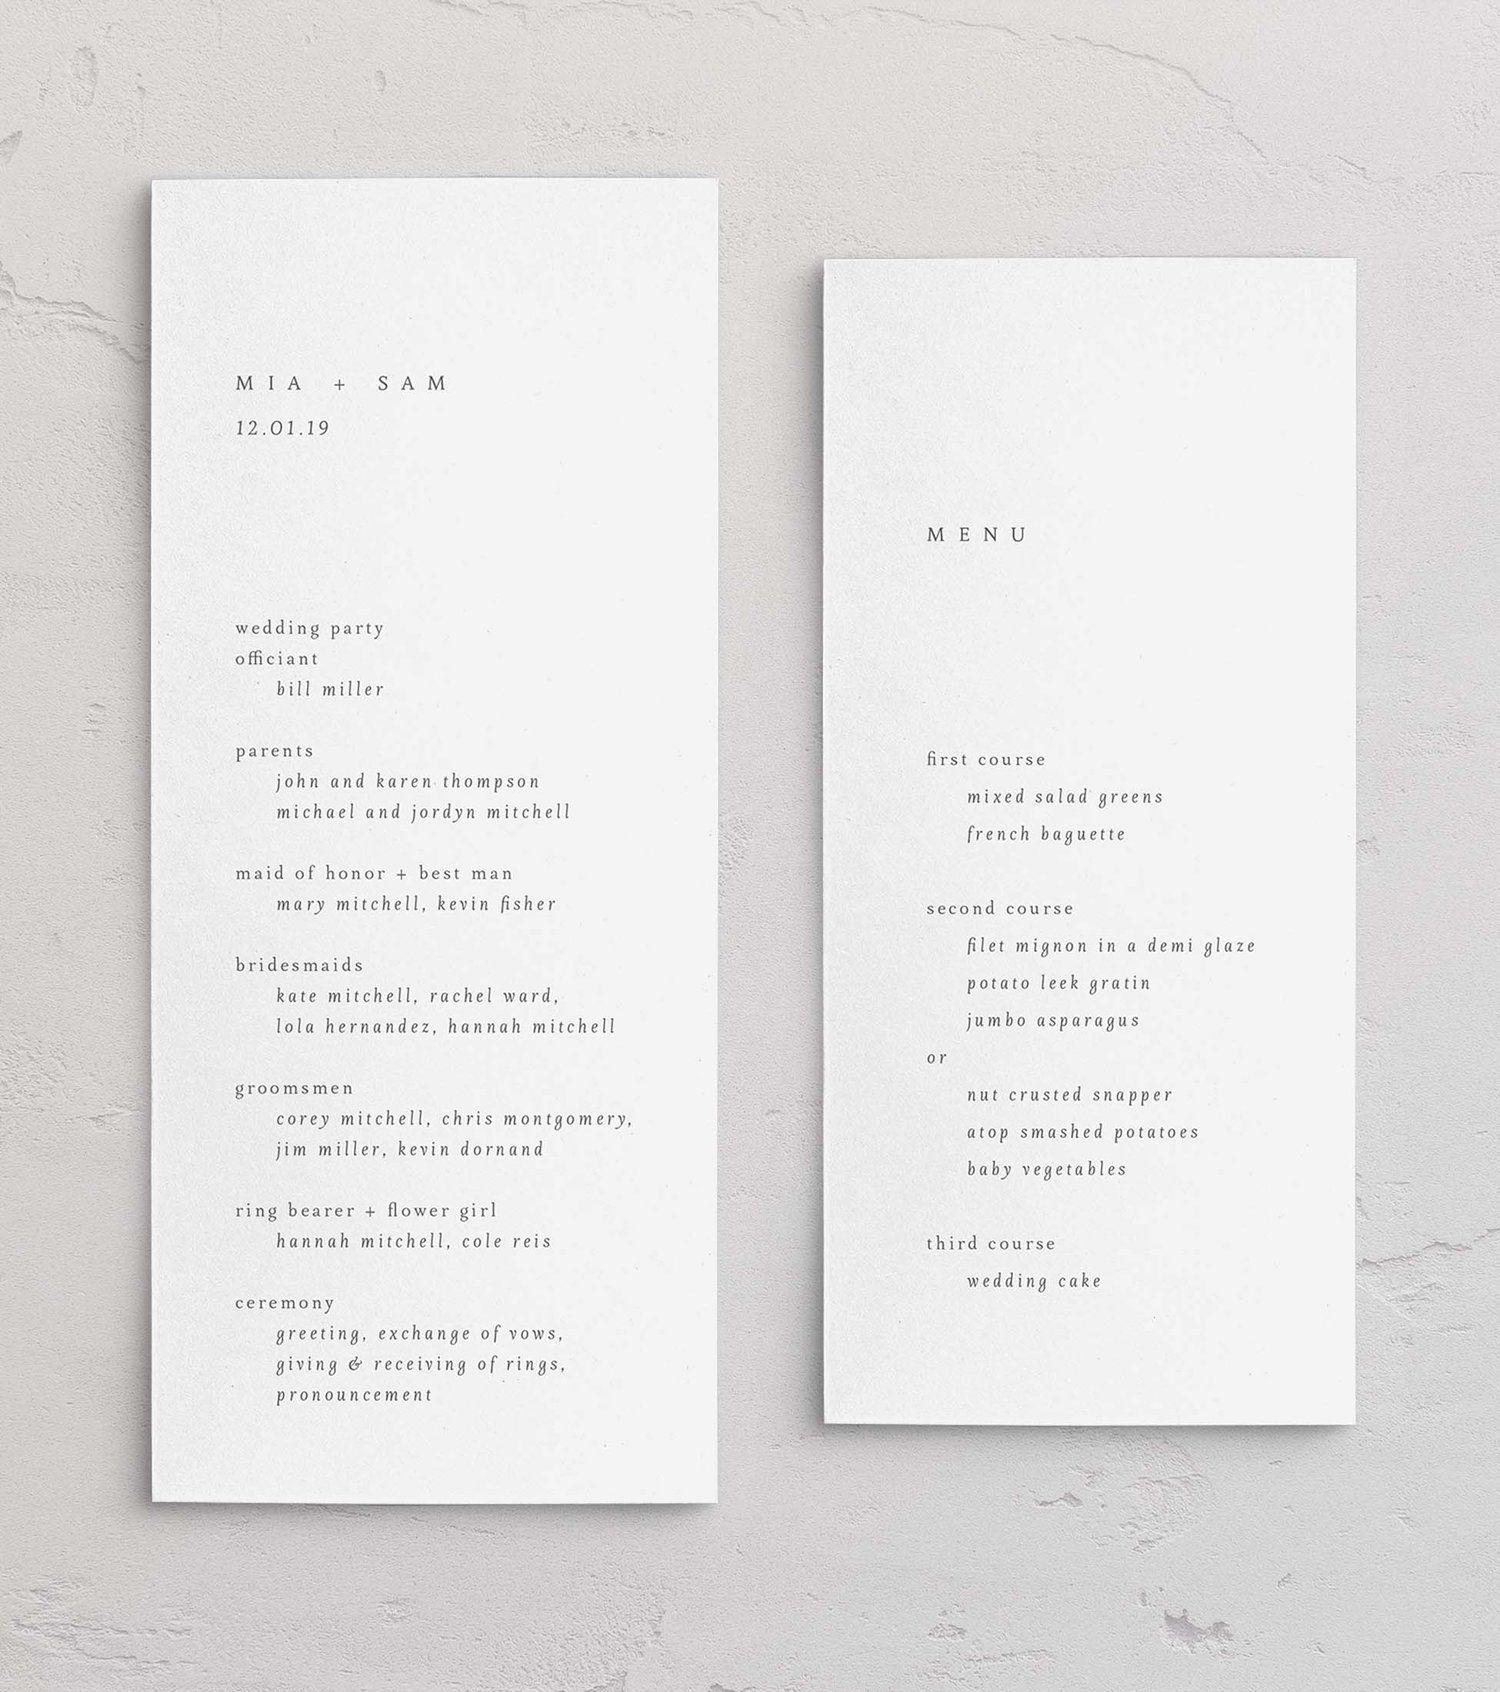 Mia Day Of Paper Wedding Invitations Letterpress Wedding Invitations Invites Save The Dates Calenda Wedding Programs Wedding Invitations Wedding Menu